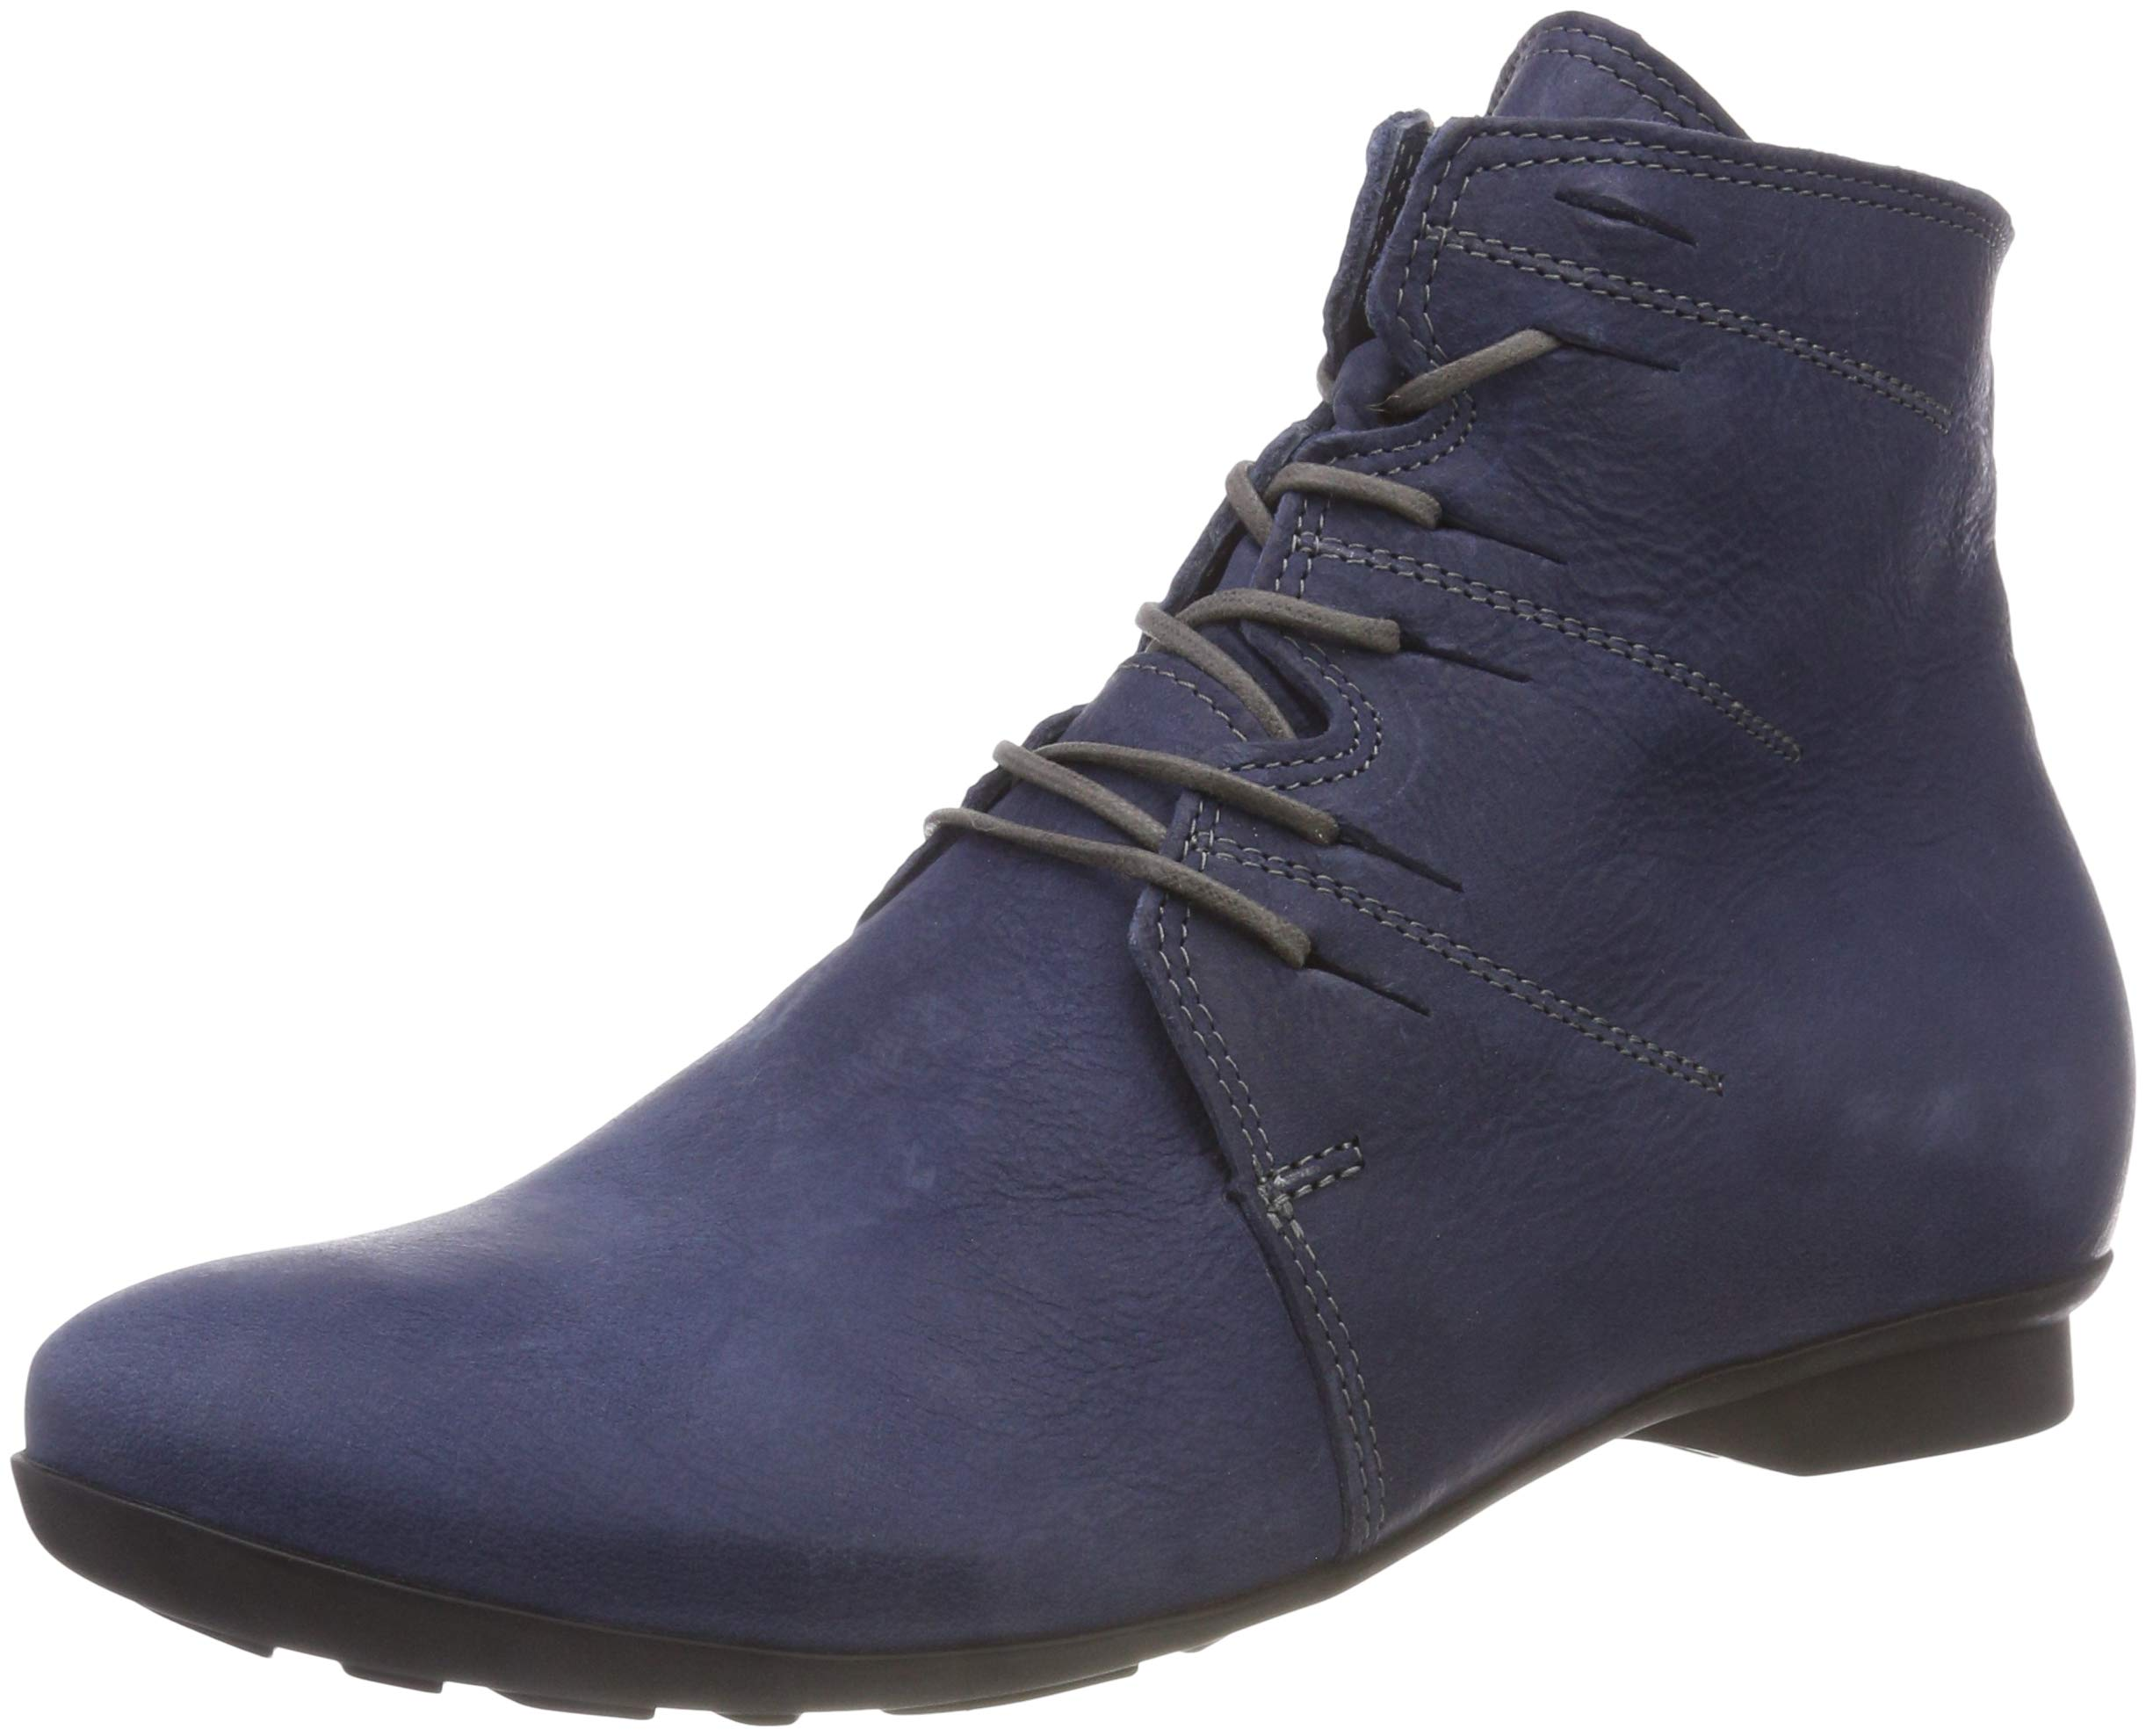 Eu Boots ThinkKeshuel 383124Desert FemmeBleu84 Navy kombi42 KJuF3l1T5c